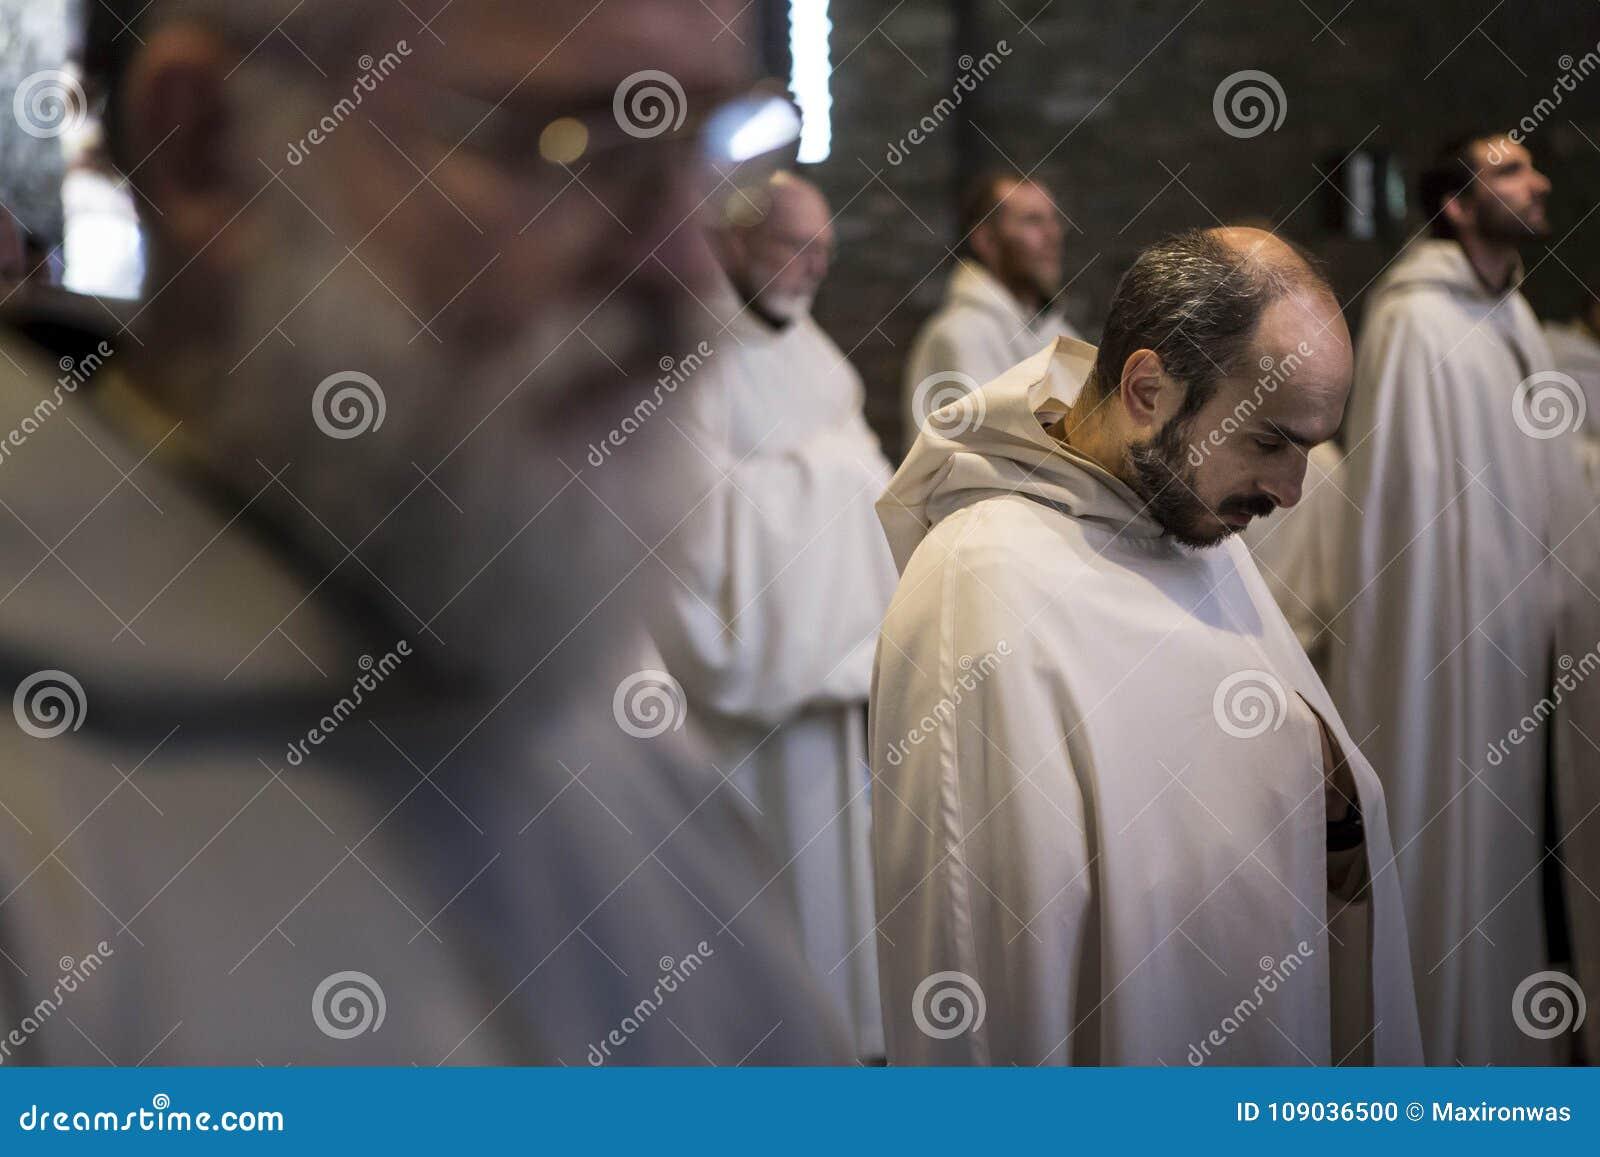 Dominus Tecum Monastery - Pra`d Mill Editorial Image - Image